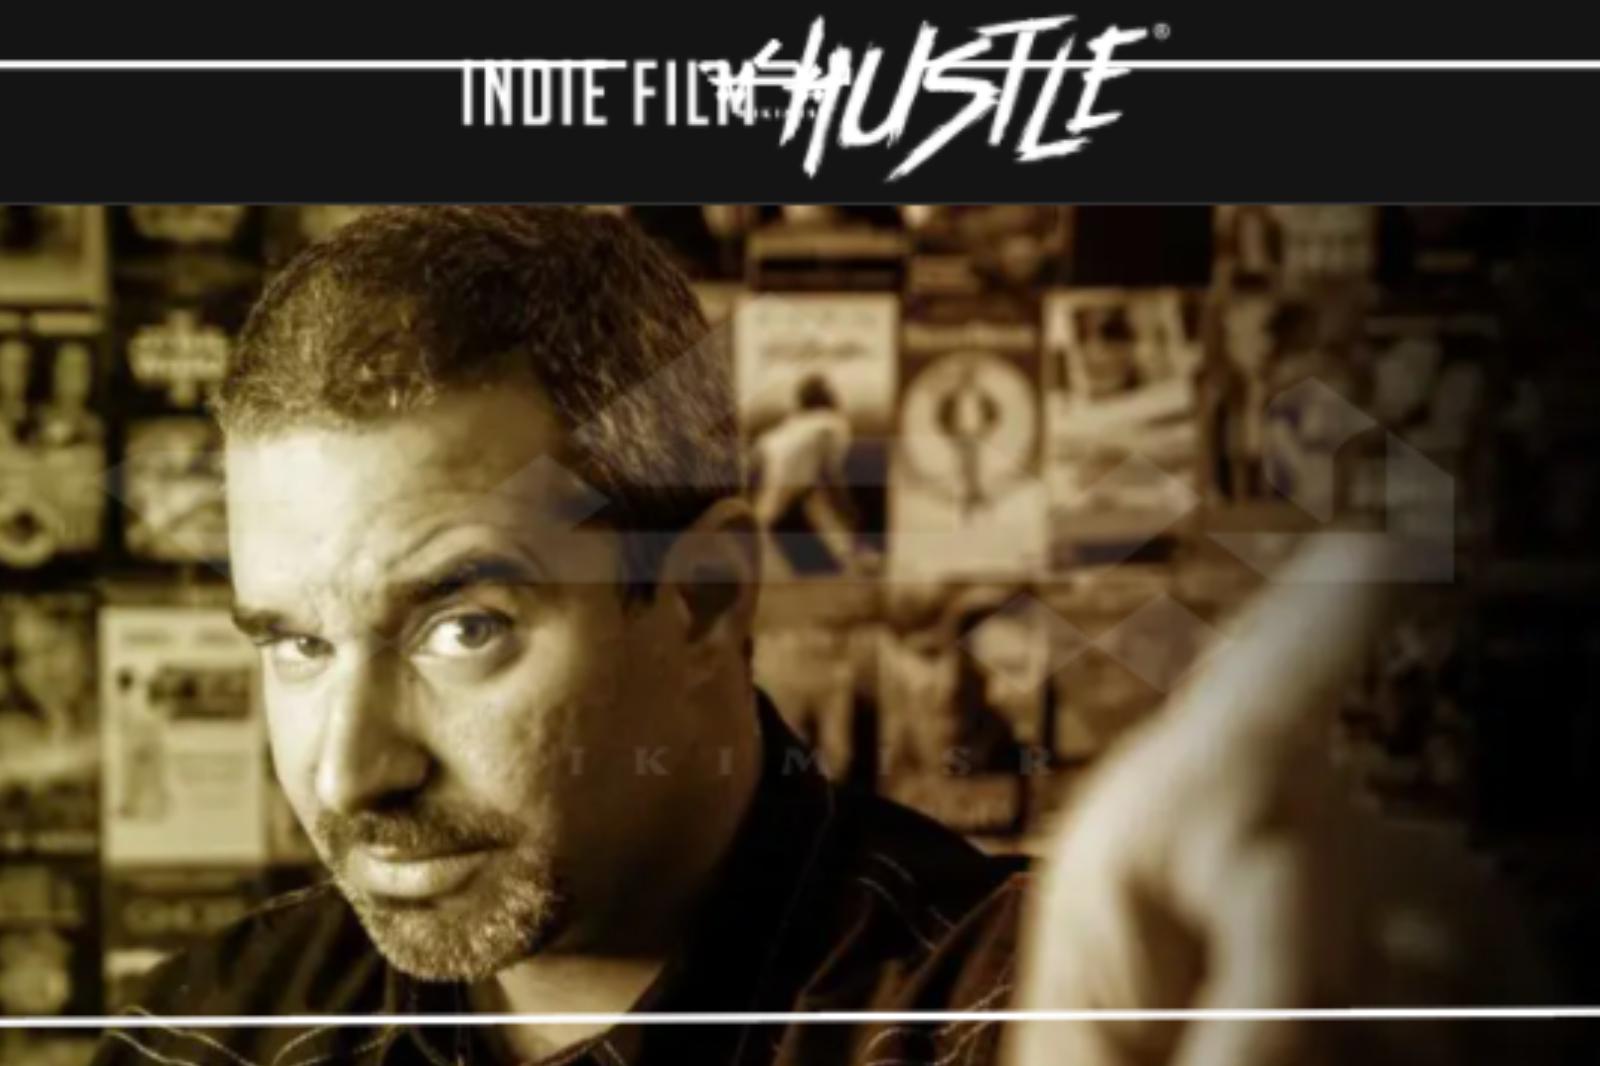 Alex Firrary and Indie Film Hustle